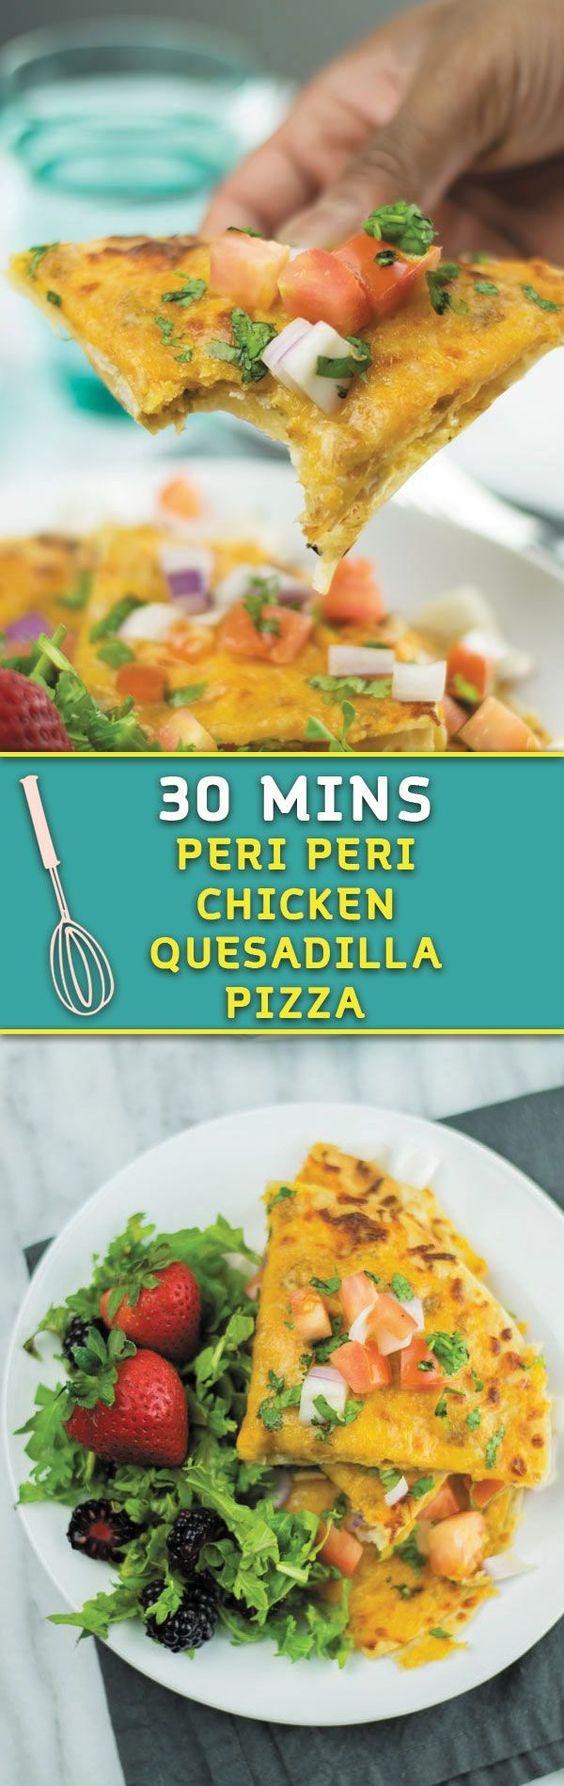 Recipes for chicken quesadilla sauce